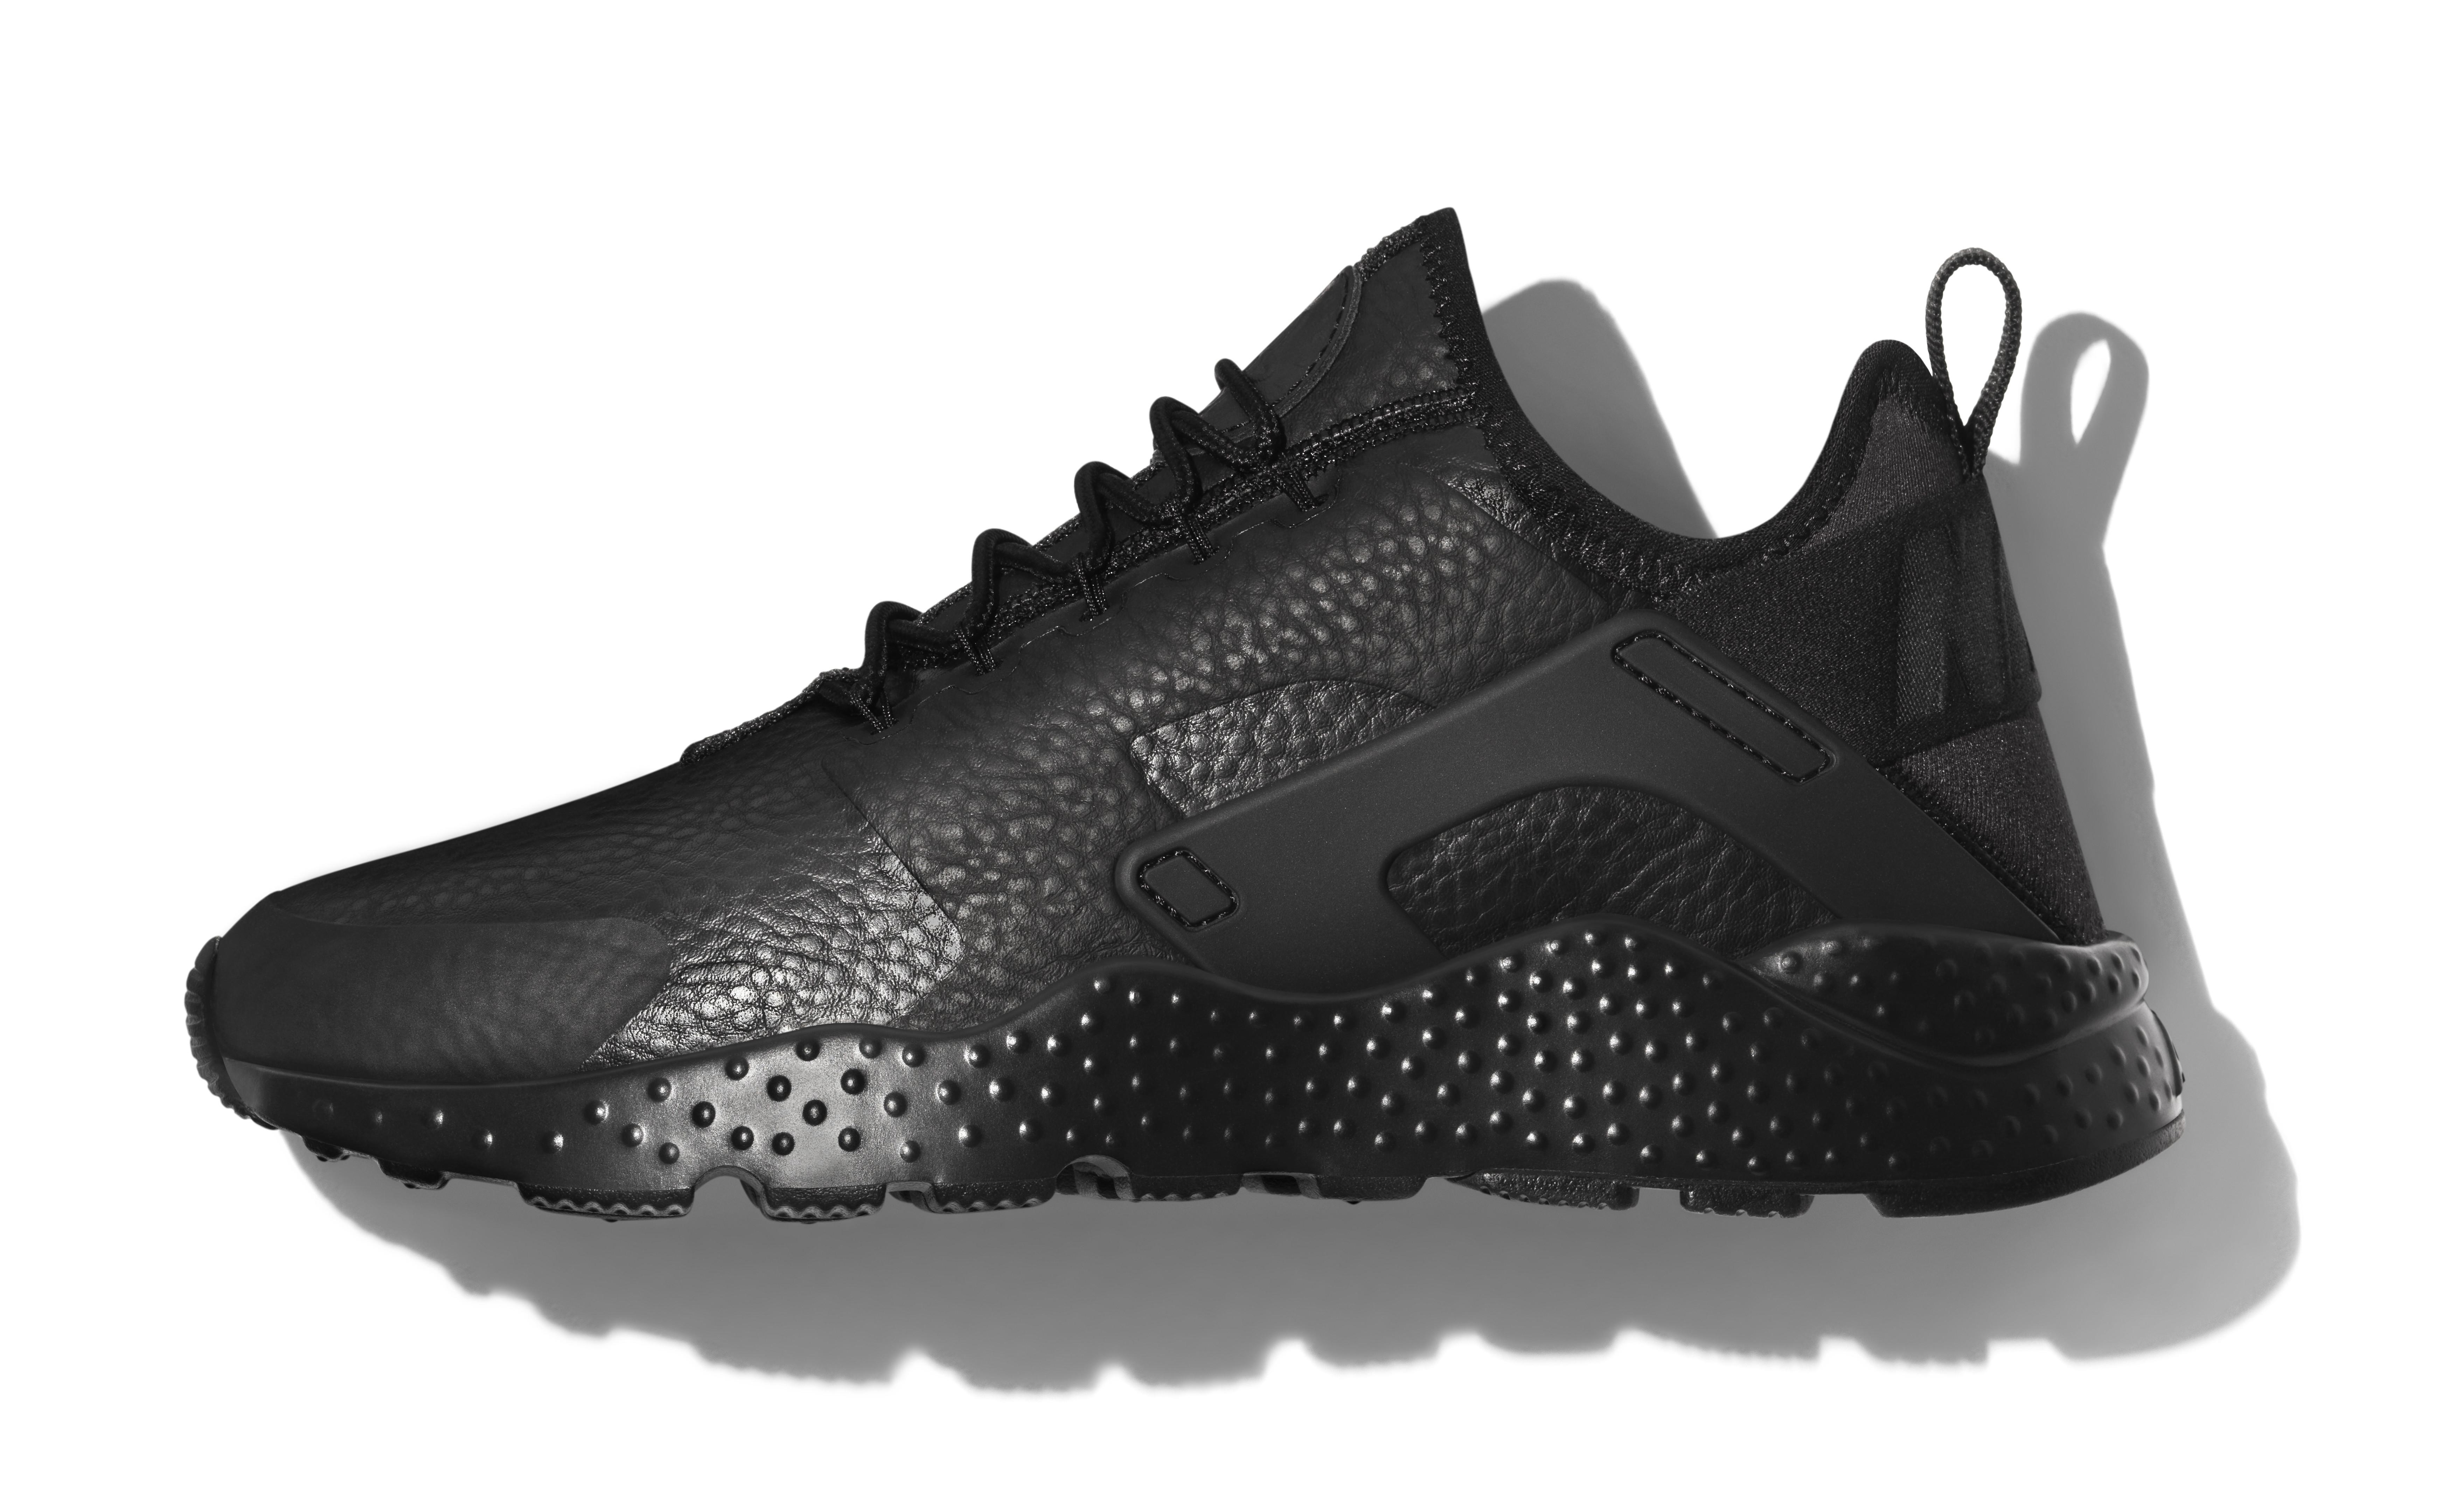 low priced ad834 7049e Nike Huarache Ultra